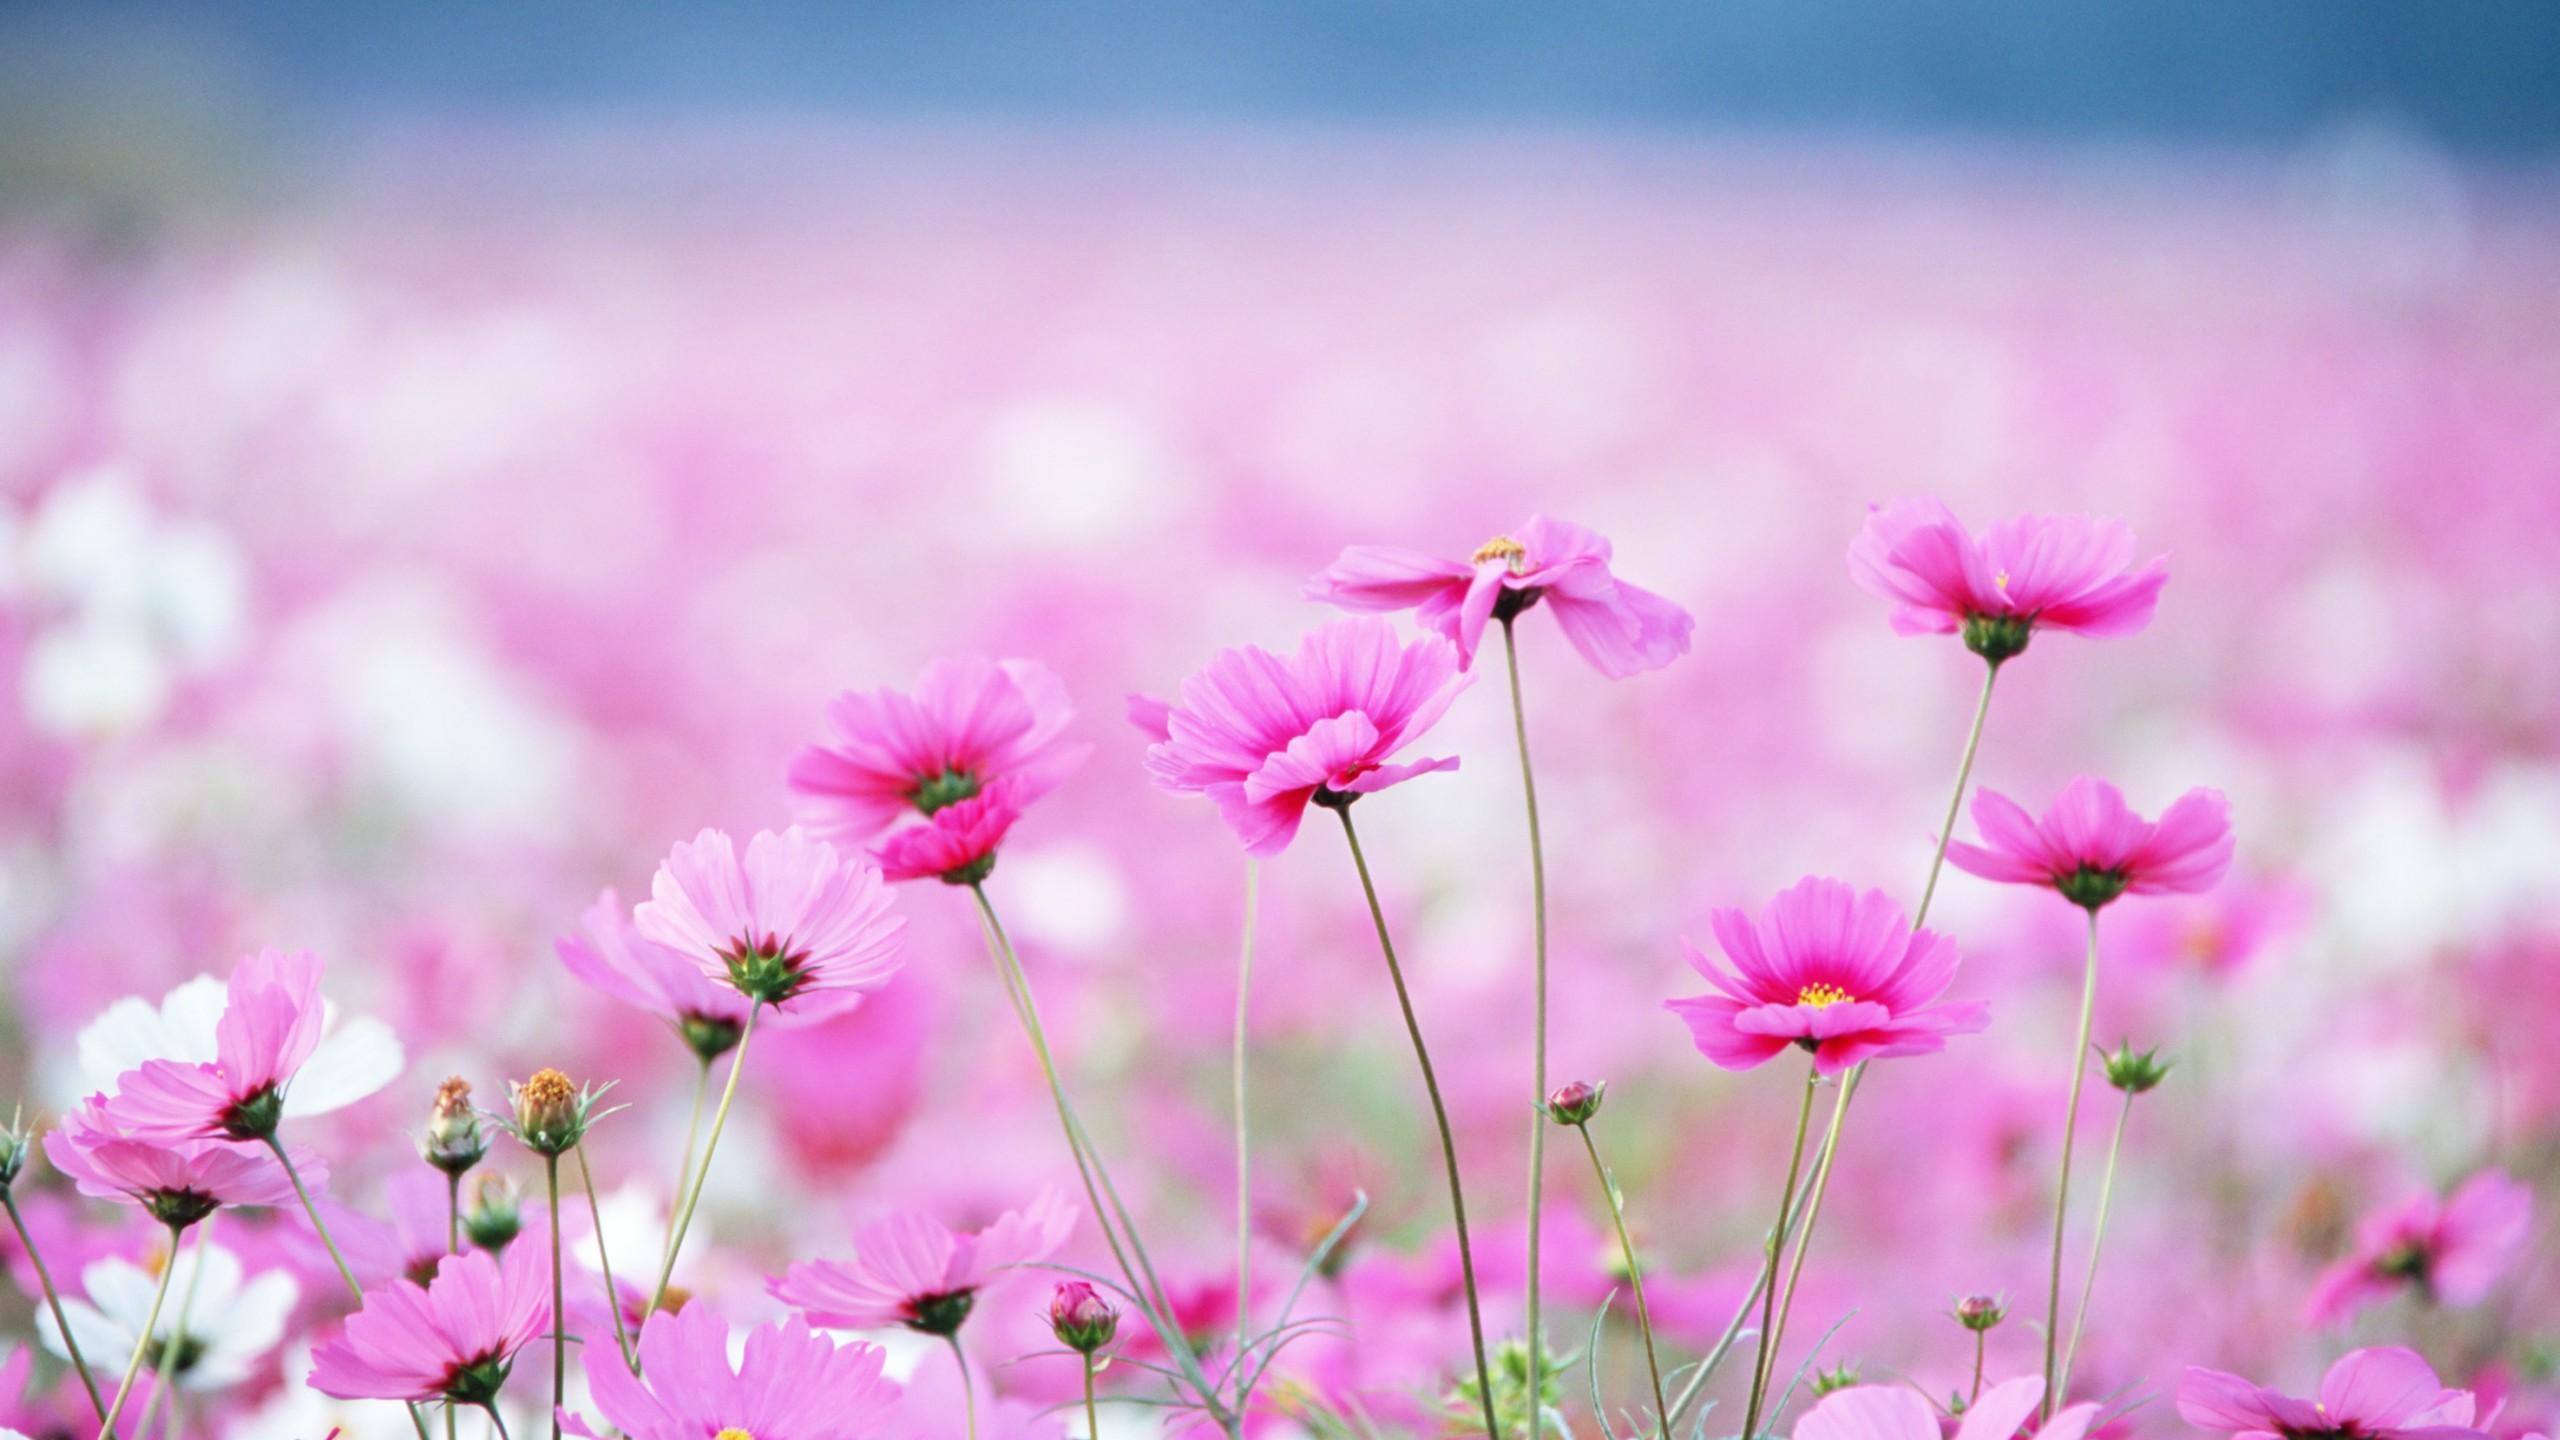 Wallpaper Wildflowers Hd 4k Wallpaper Field Pink Flower Nature